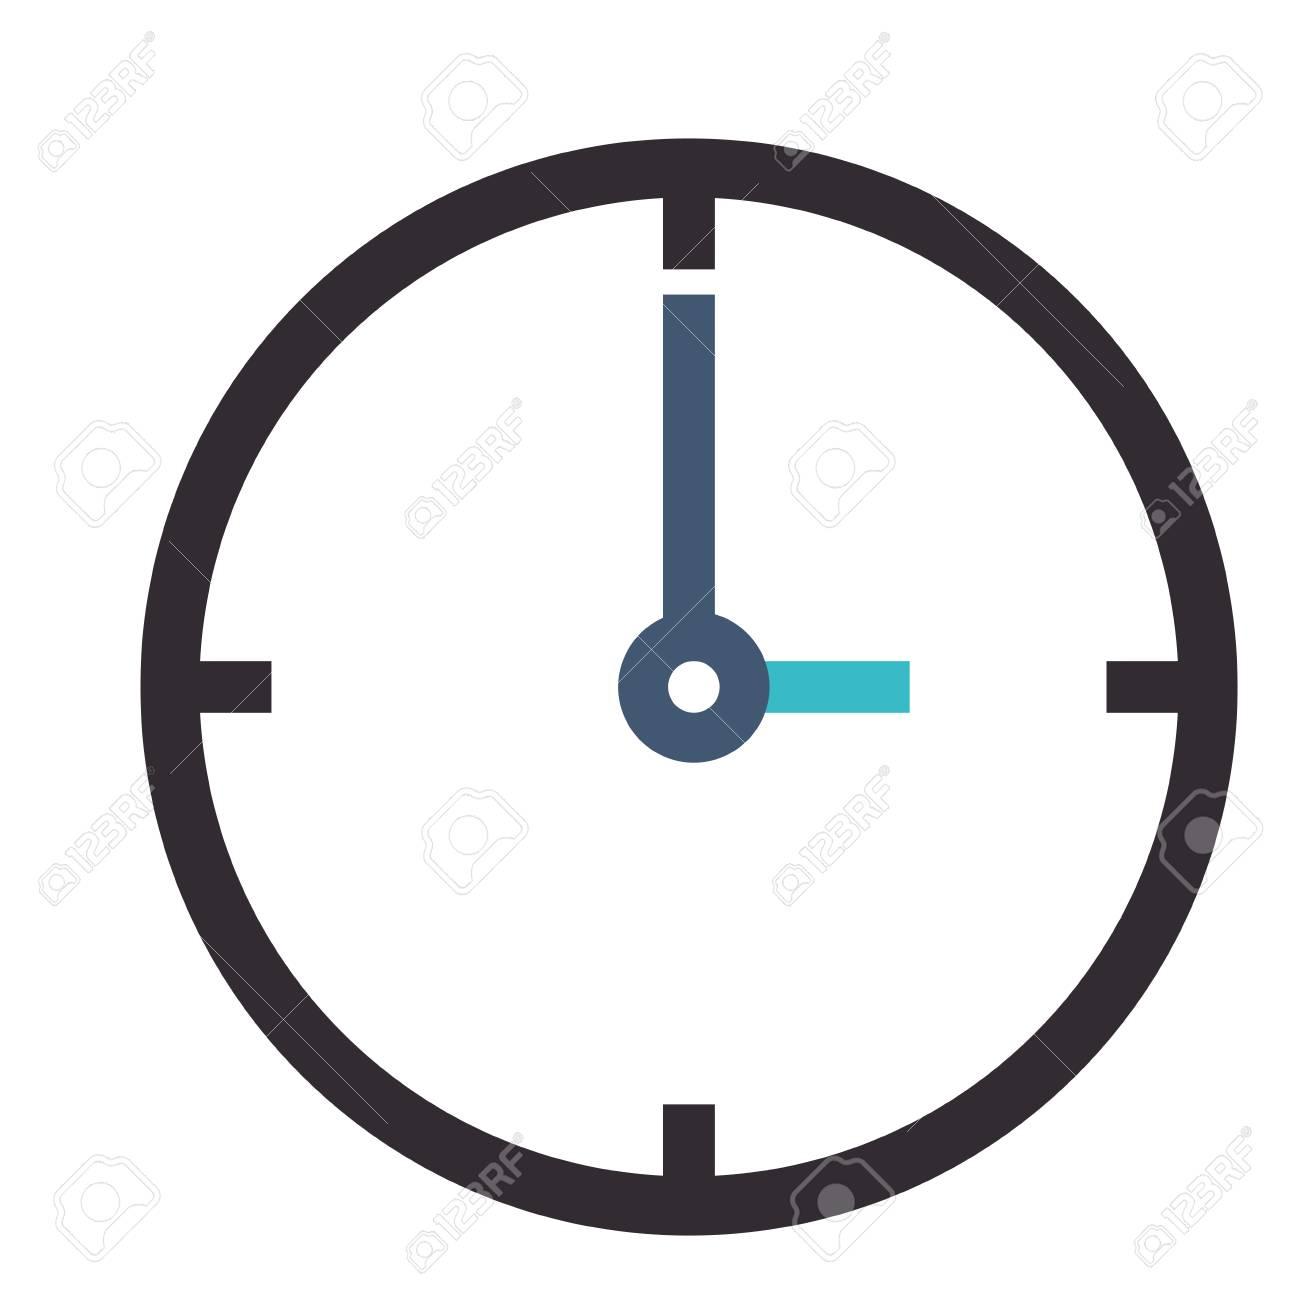 flat design simple clock icon vector illustration royalty free rh 123rf com sand clock icon vector clock icon vector free